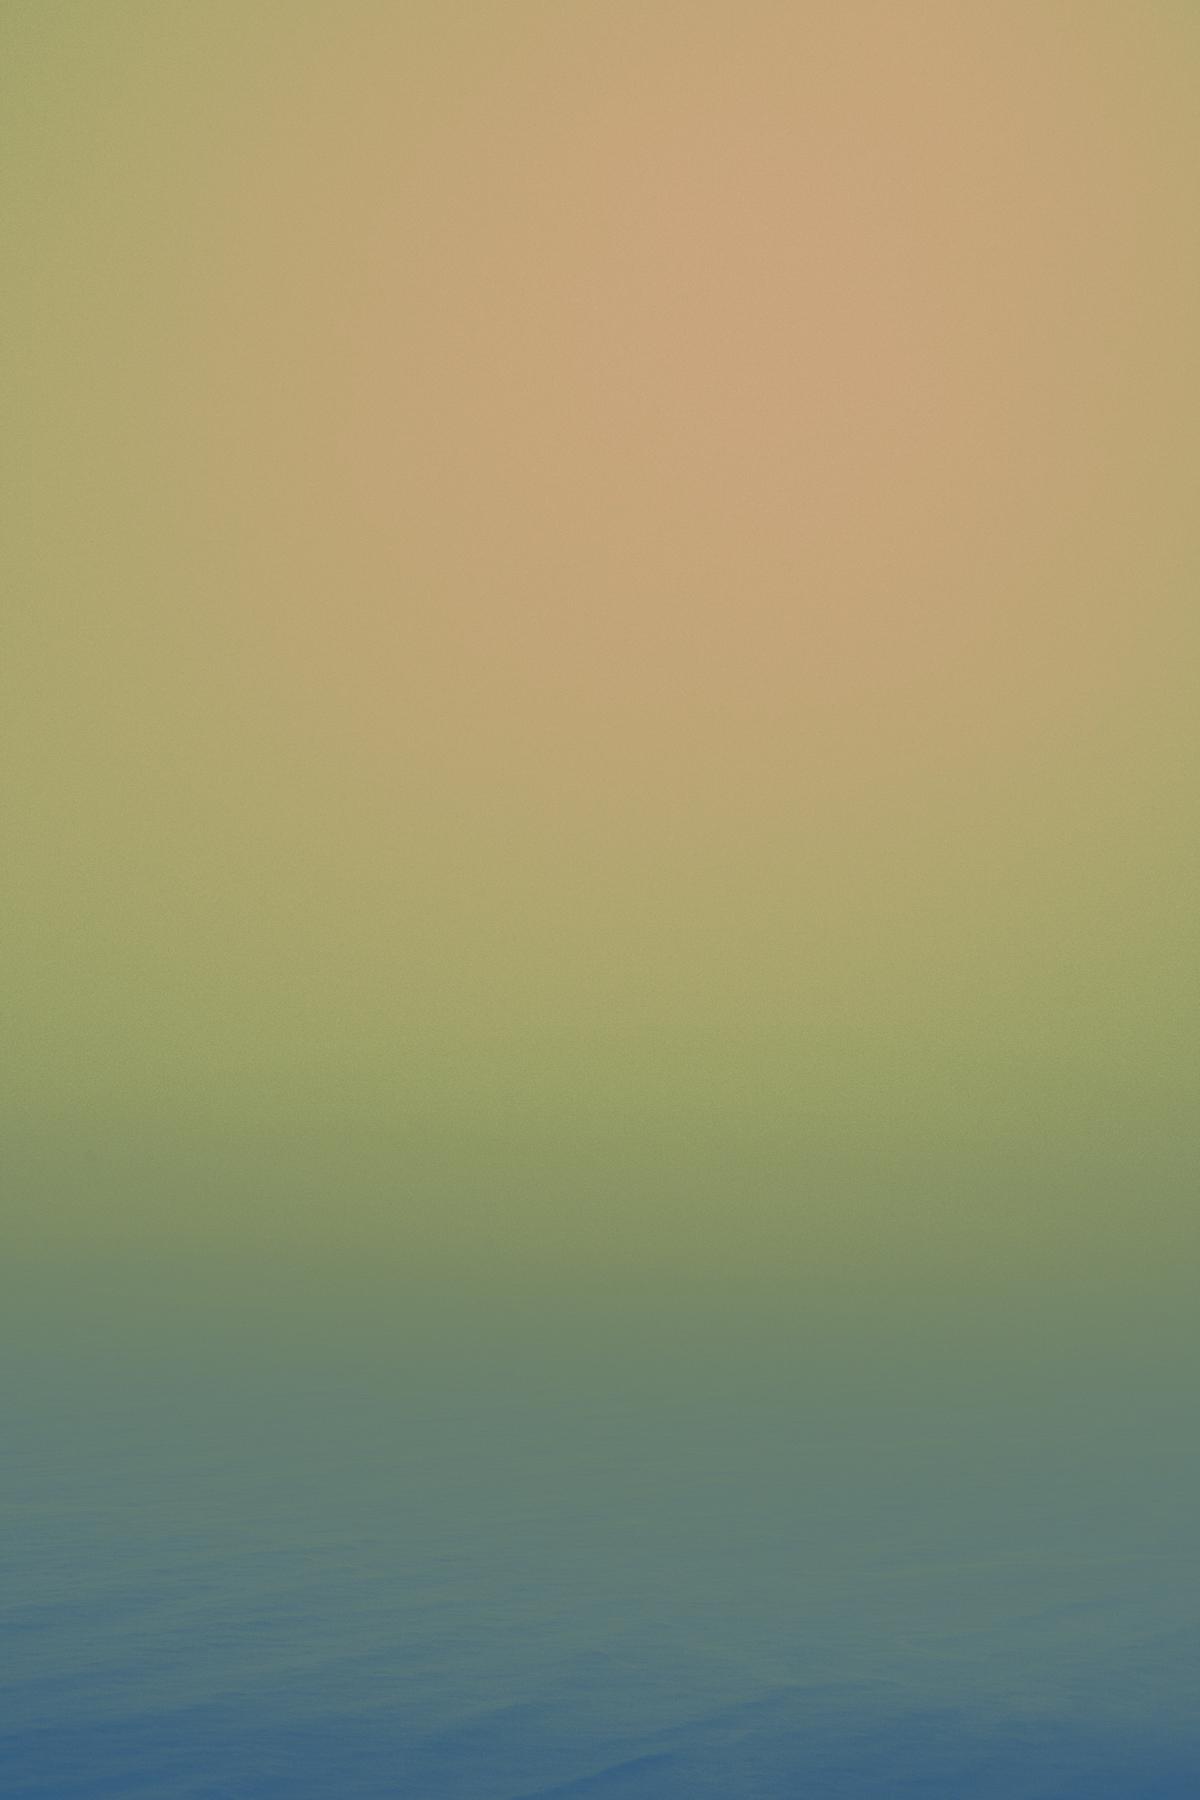 IMG_9256 blue.jpg